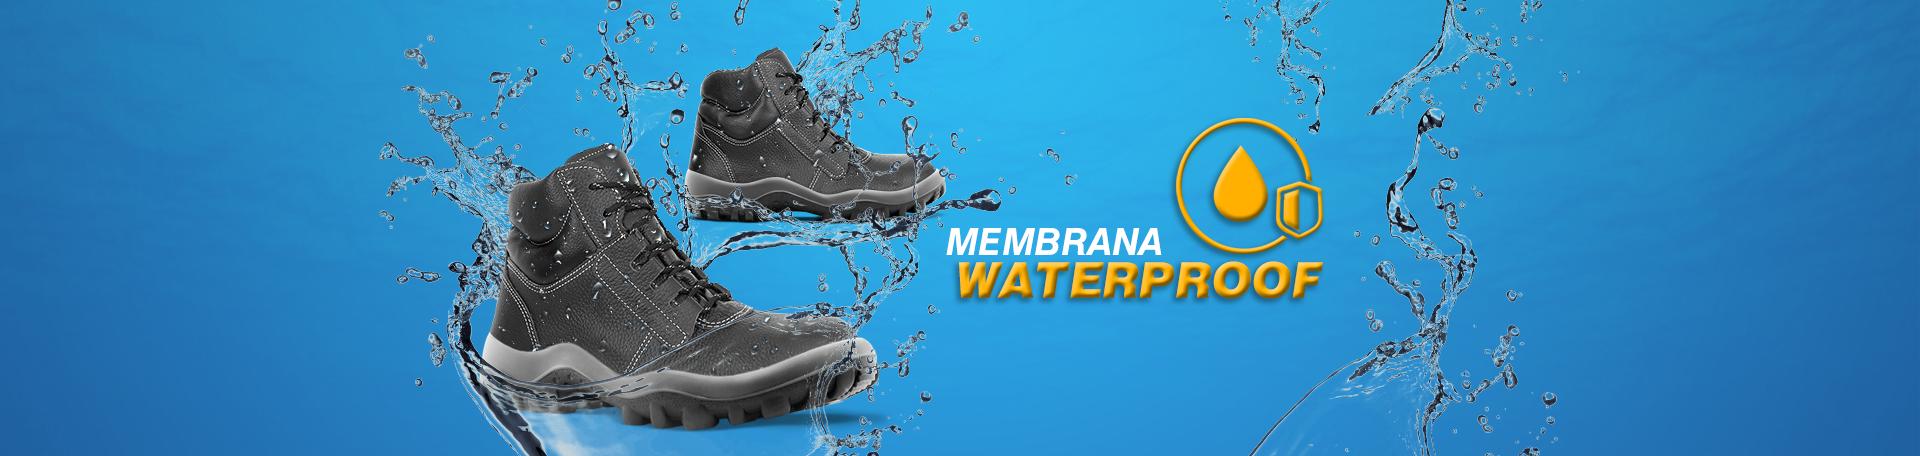 Calçado-waterproof-safetline